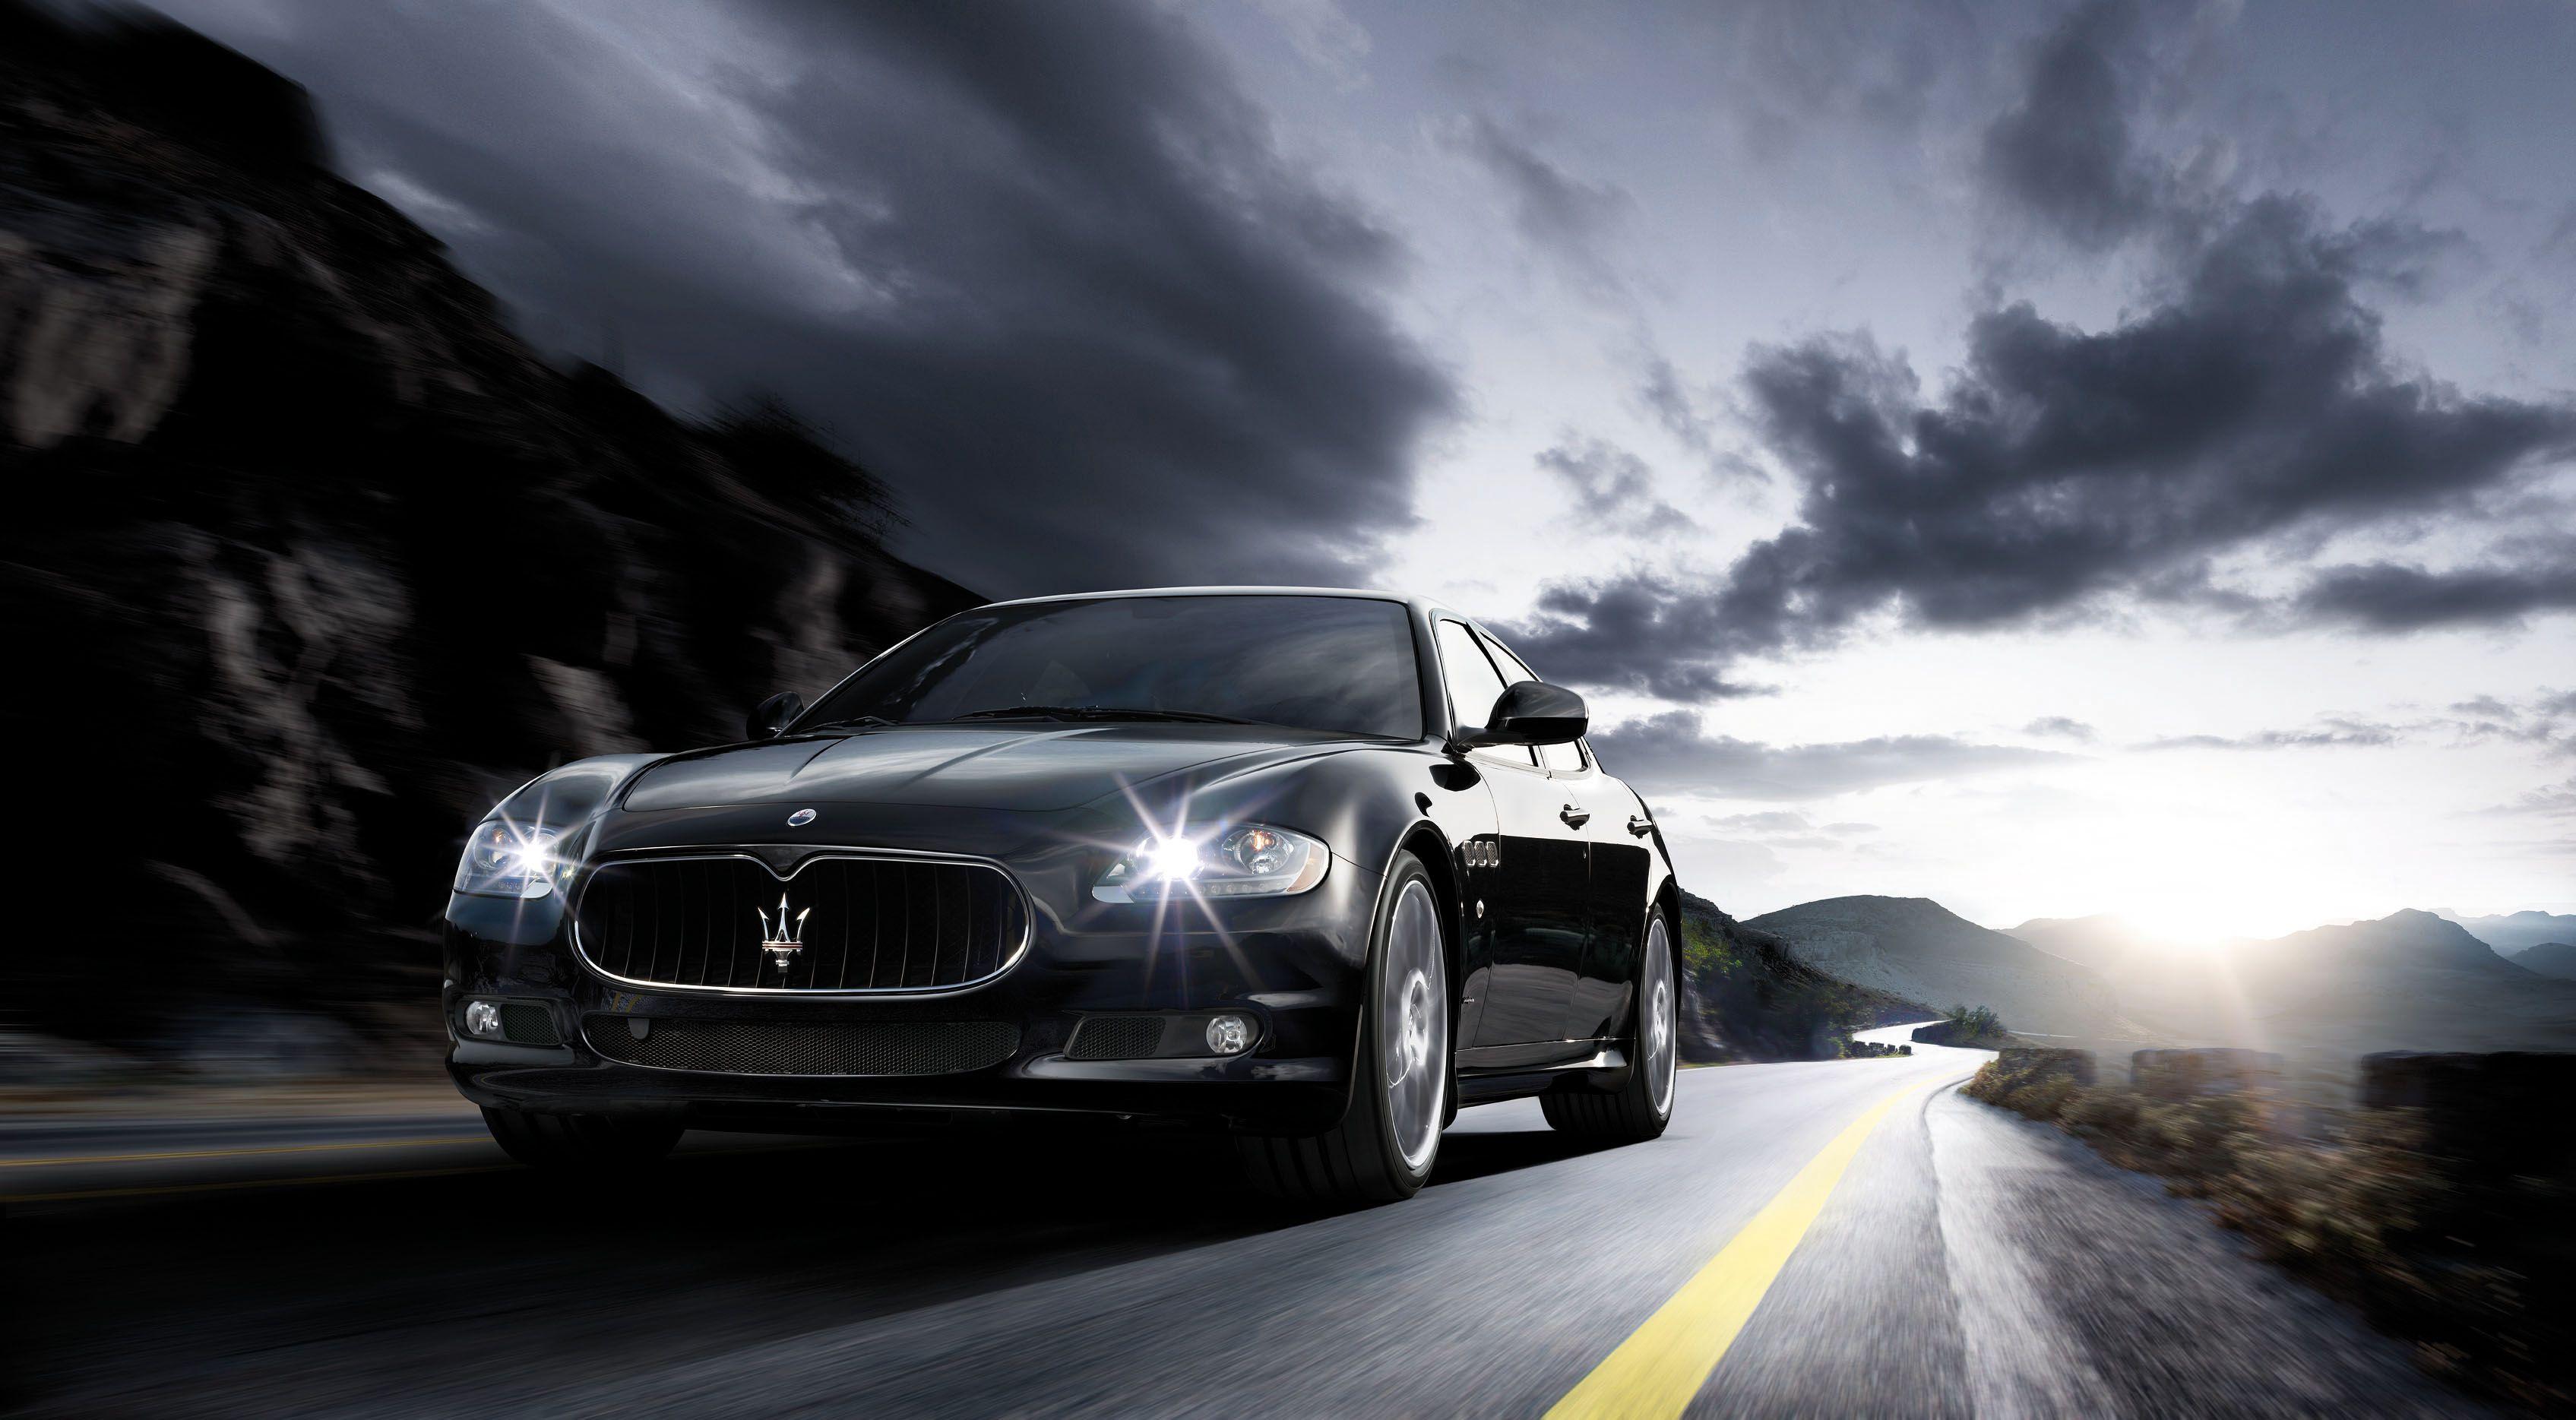 Asus gaming desktops amp monitors brochures from cee show 2016 singapore - Maserati Quattroporte 4 High Resolution Car Wallpaper Maserati Quattroporte Sport